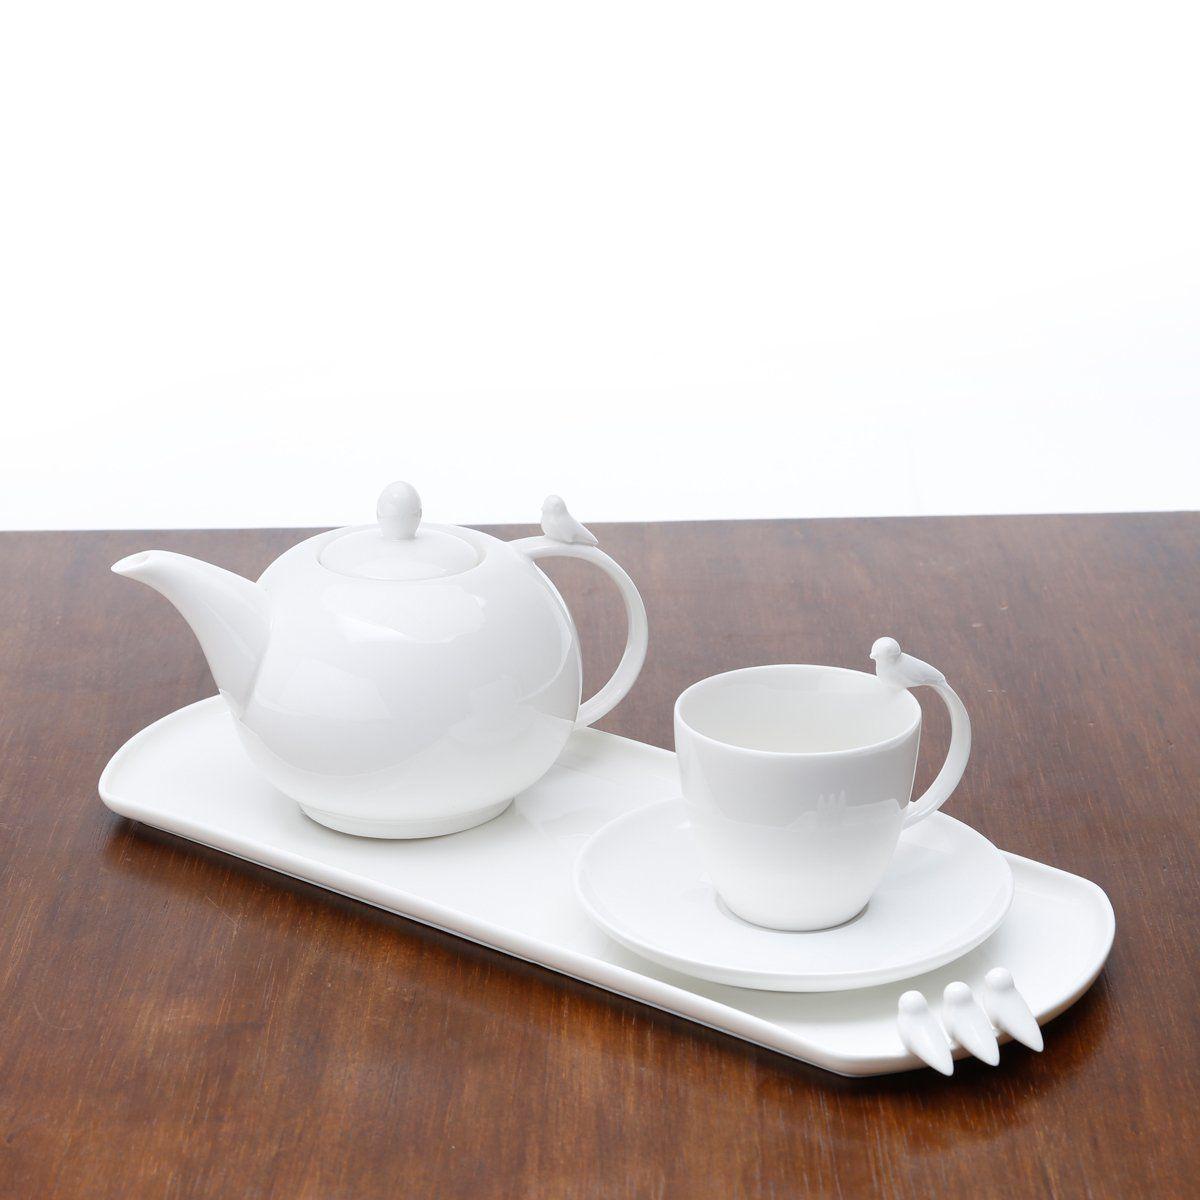 Prato 41 x 16 cm para bolo de porcelana branca Birds Wolff - 17246